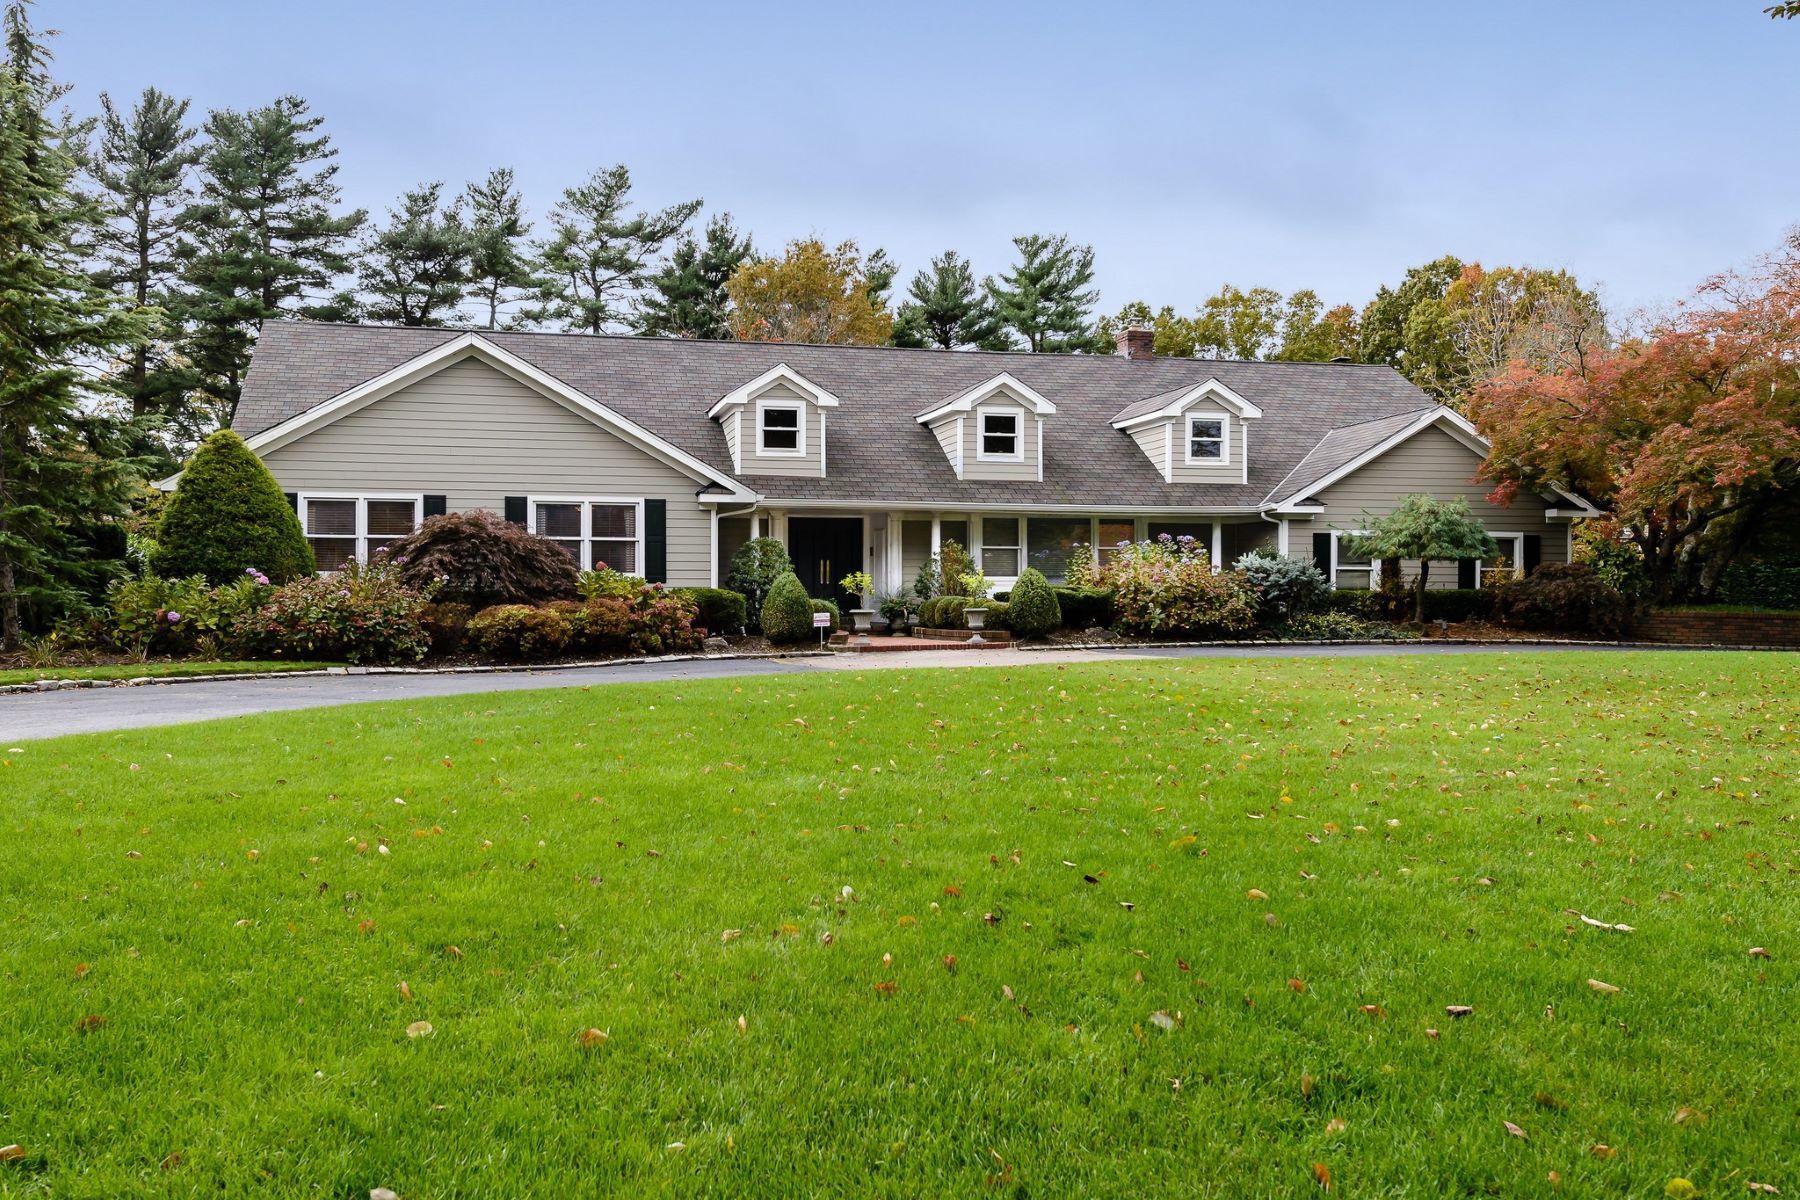 واحد منزل الأسرة للـ Sale في 10 Terrace Ct , Old Westbury, NY 11568 10 Terrace Ct, Old Westbury, New York, 11568 United States